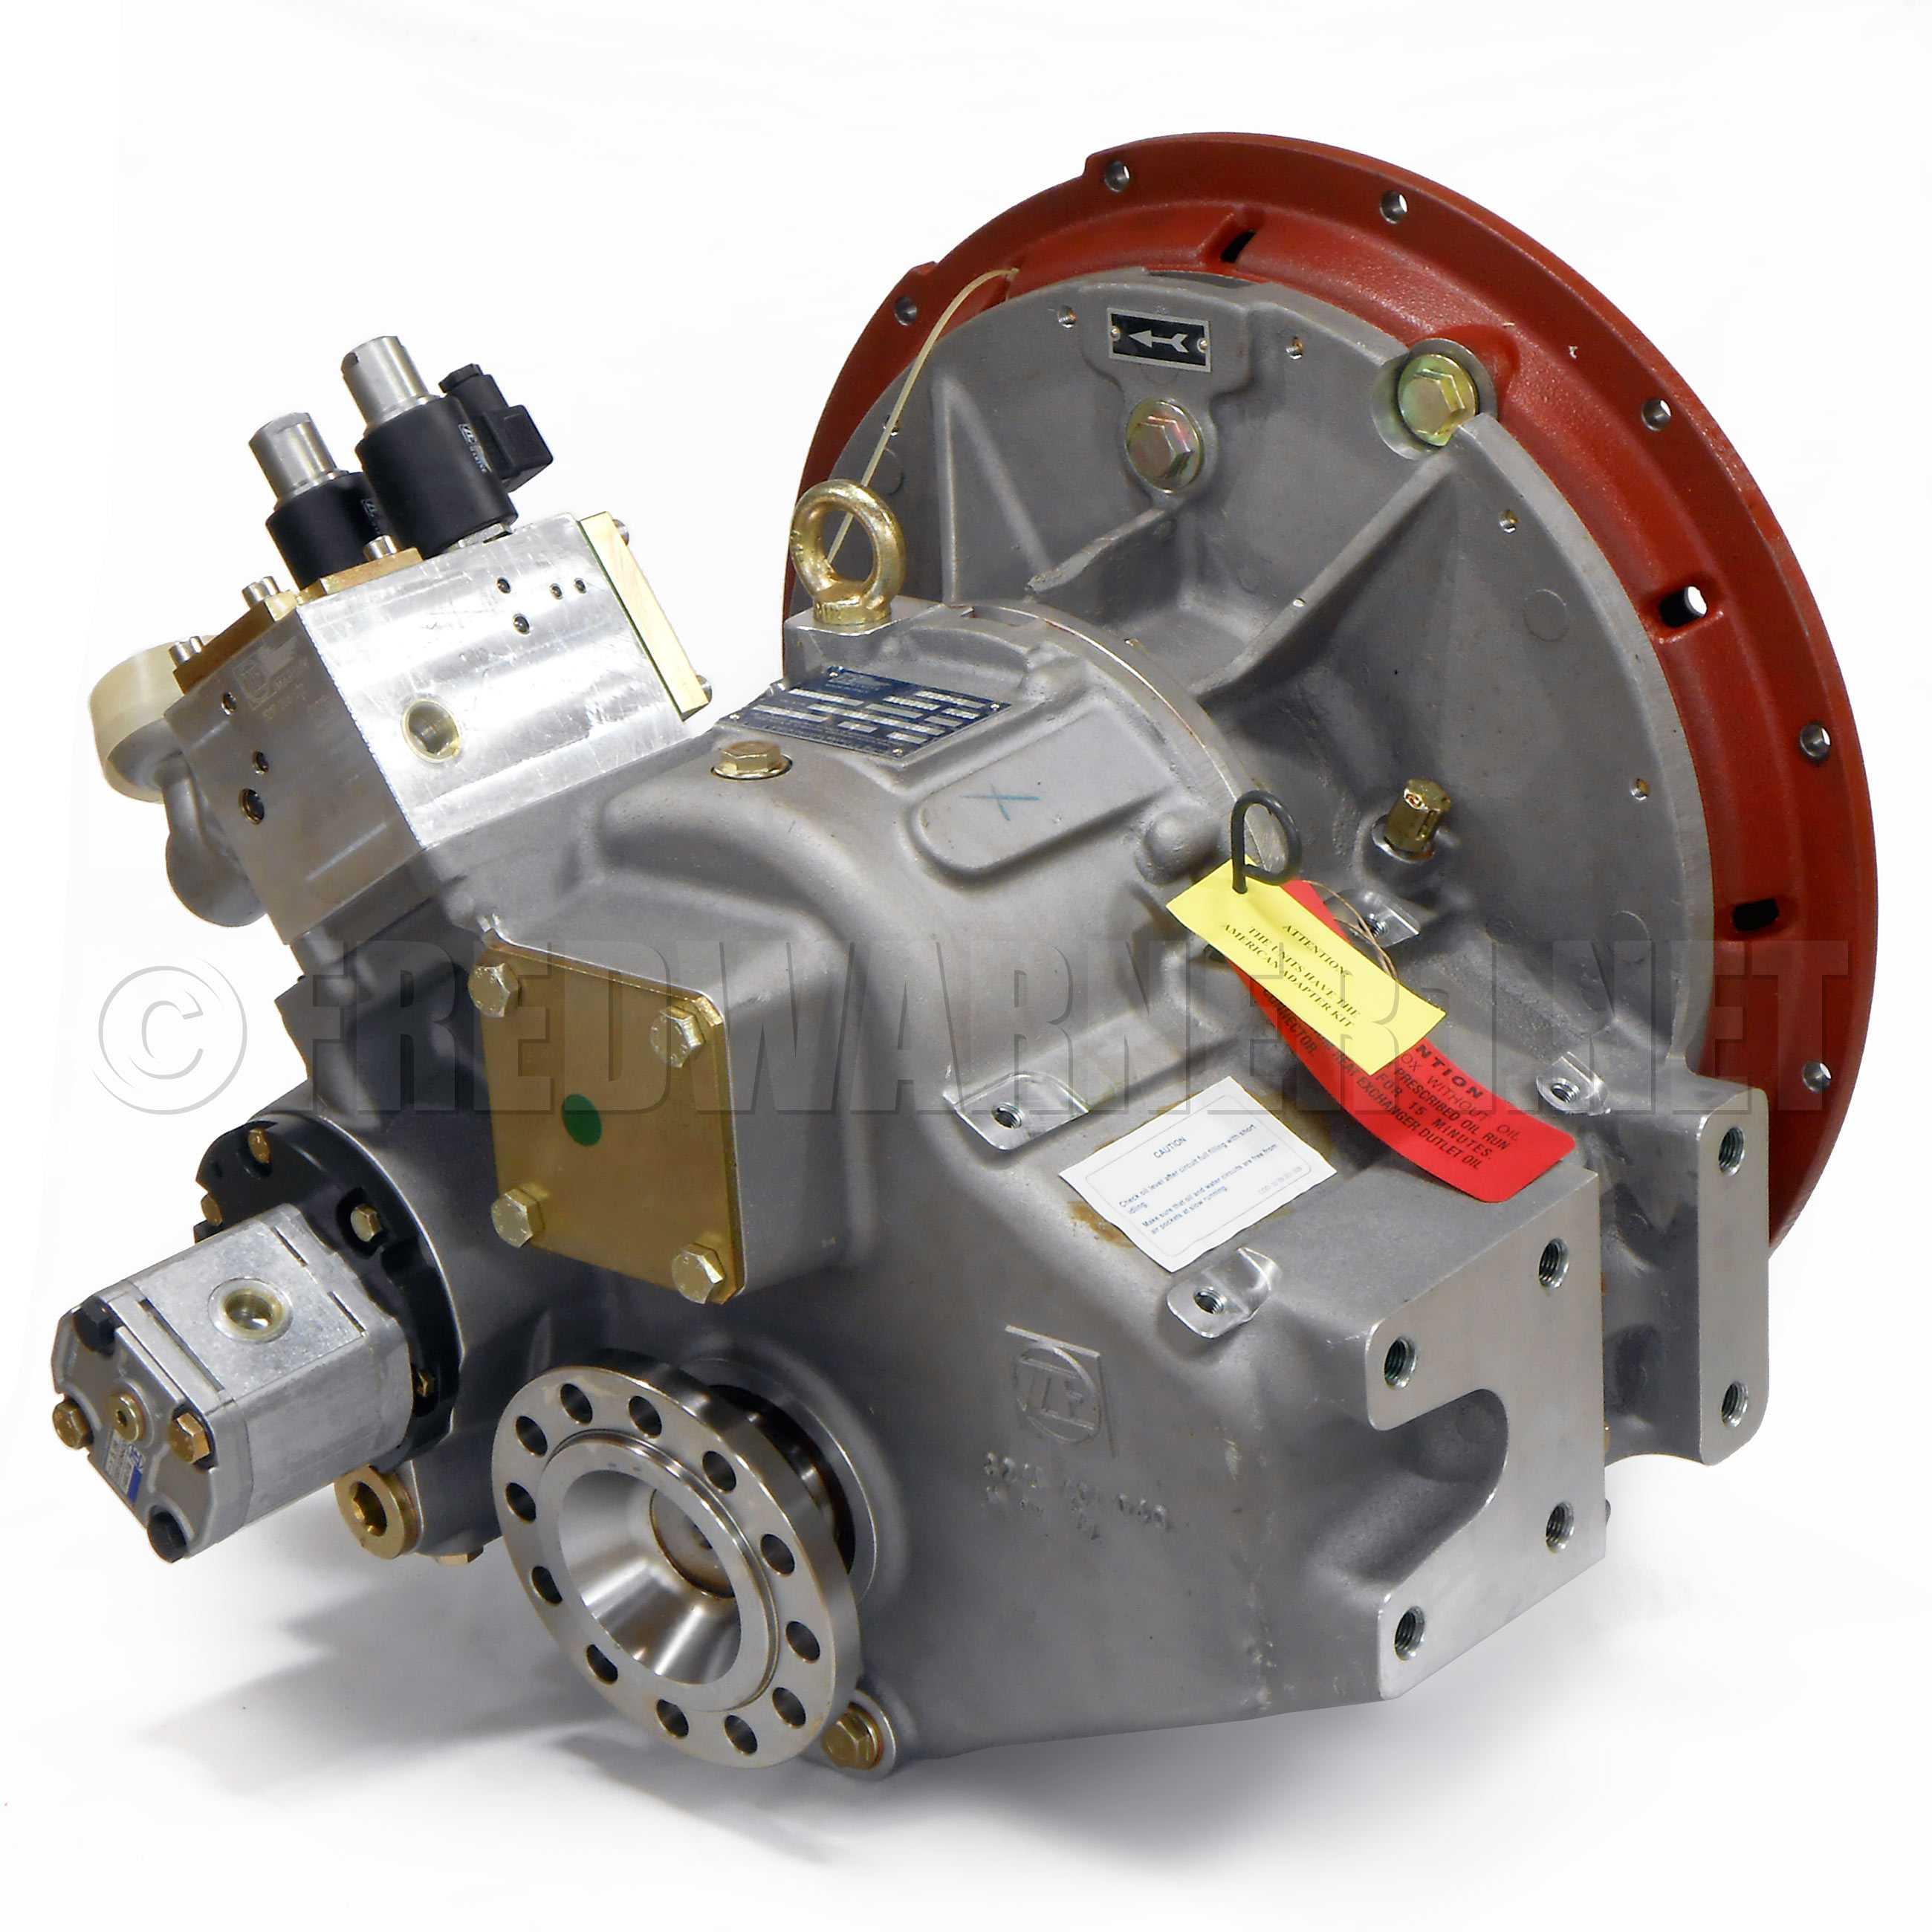 ZF 325-1A 1 733:1 Marine Boat Transmission 24V Down-Angle 3214001038 VKE  4011S